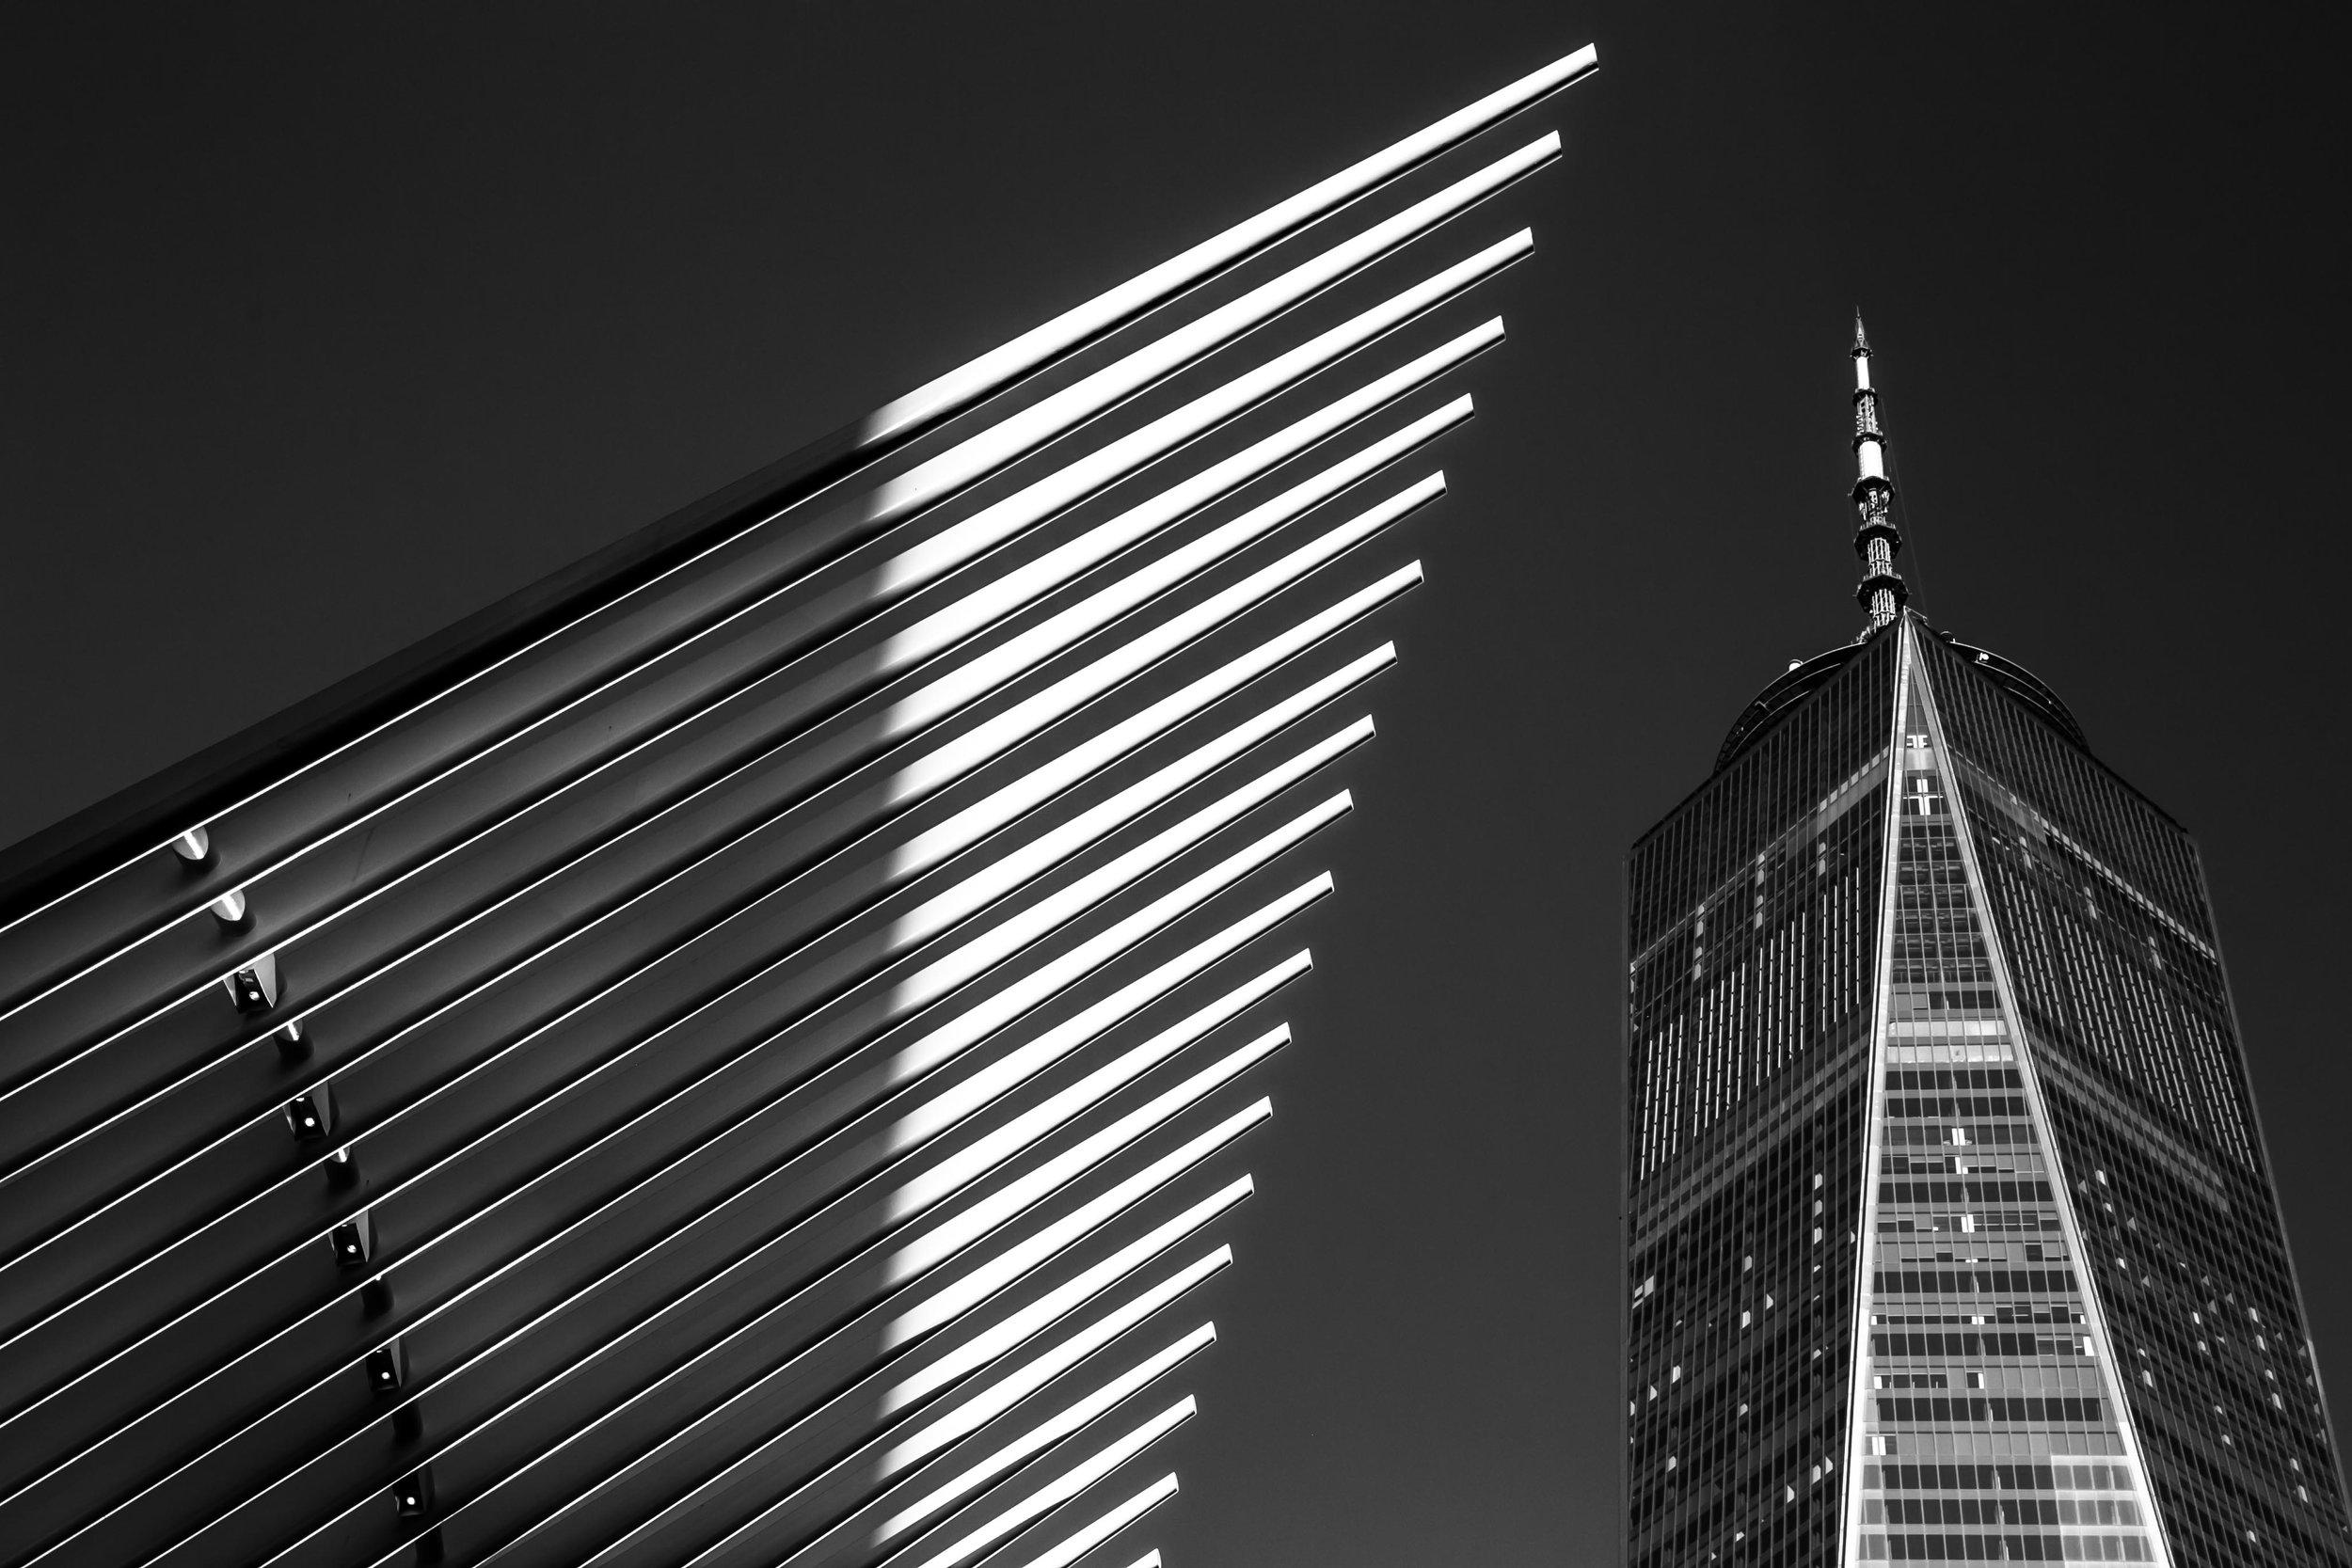 Oculus, Freedom Tower, NYC